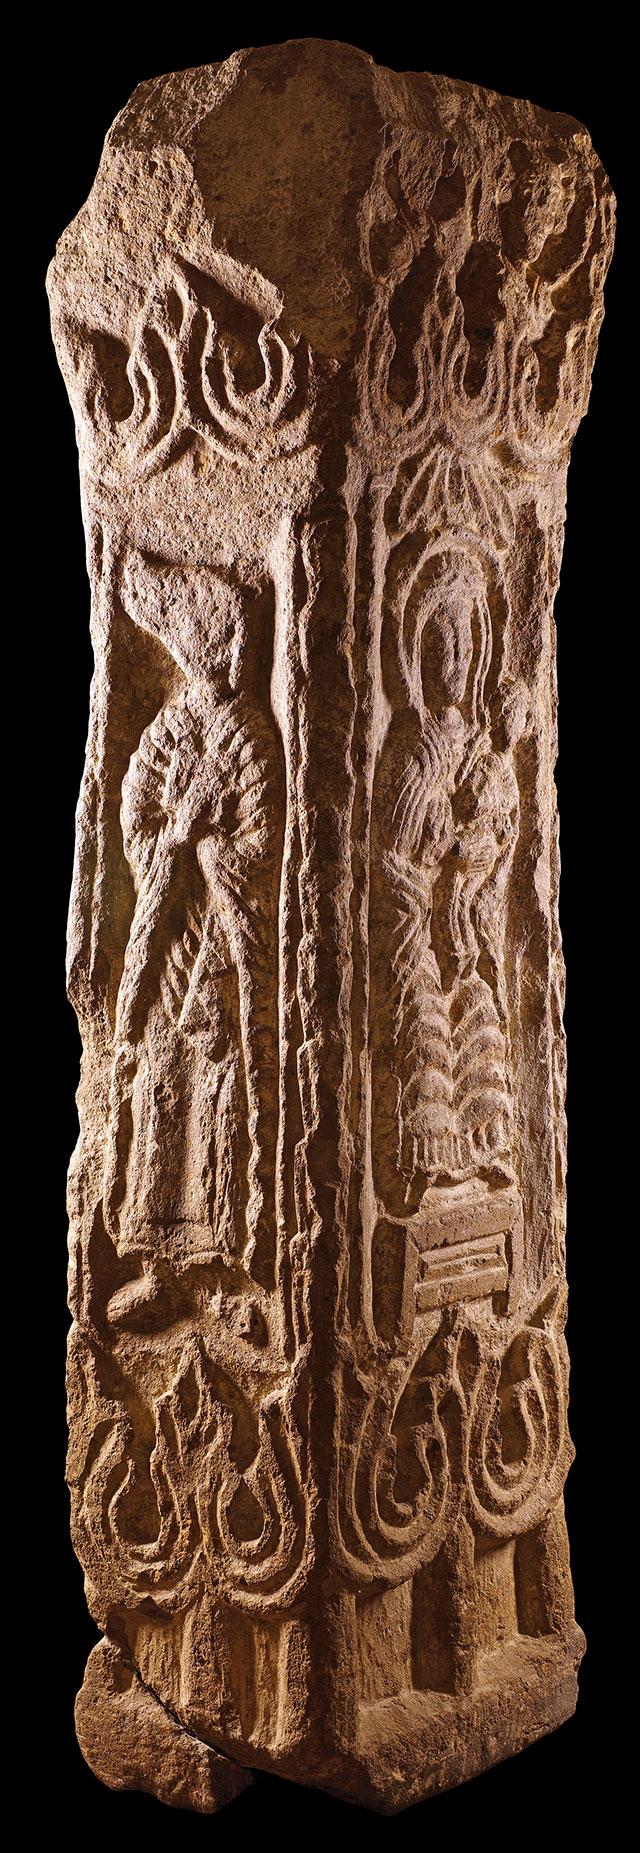 Four-Sided Stela. Monastery of Kharaba (Kharabavank'), southern slope of Aragats, Ashtarak, 4th–5th century. Tuff. 69 11⁄16 × 15 3⁄4 × 15 3⁄4 in. (177 × 40 × 40 cm). History Museum of Armenia, Yerevan (830)